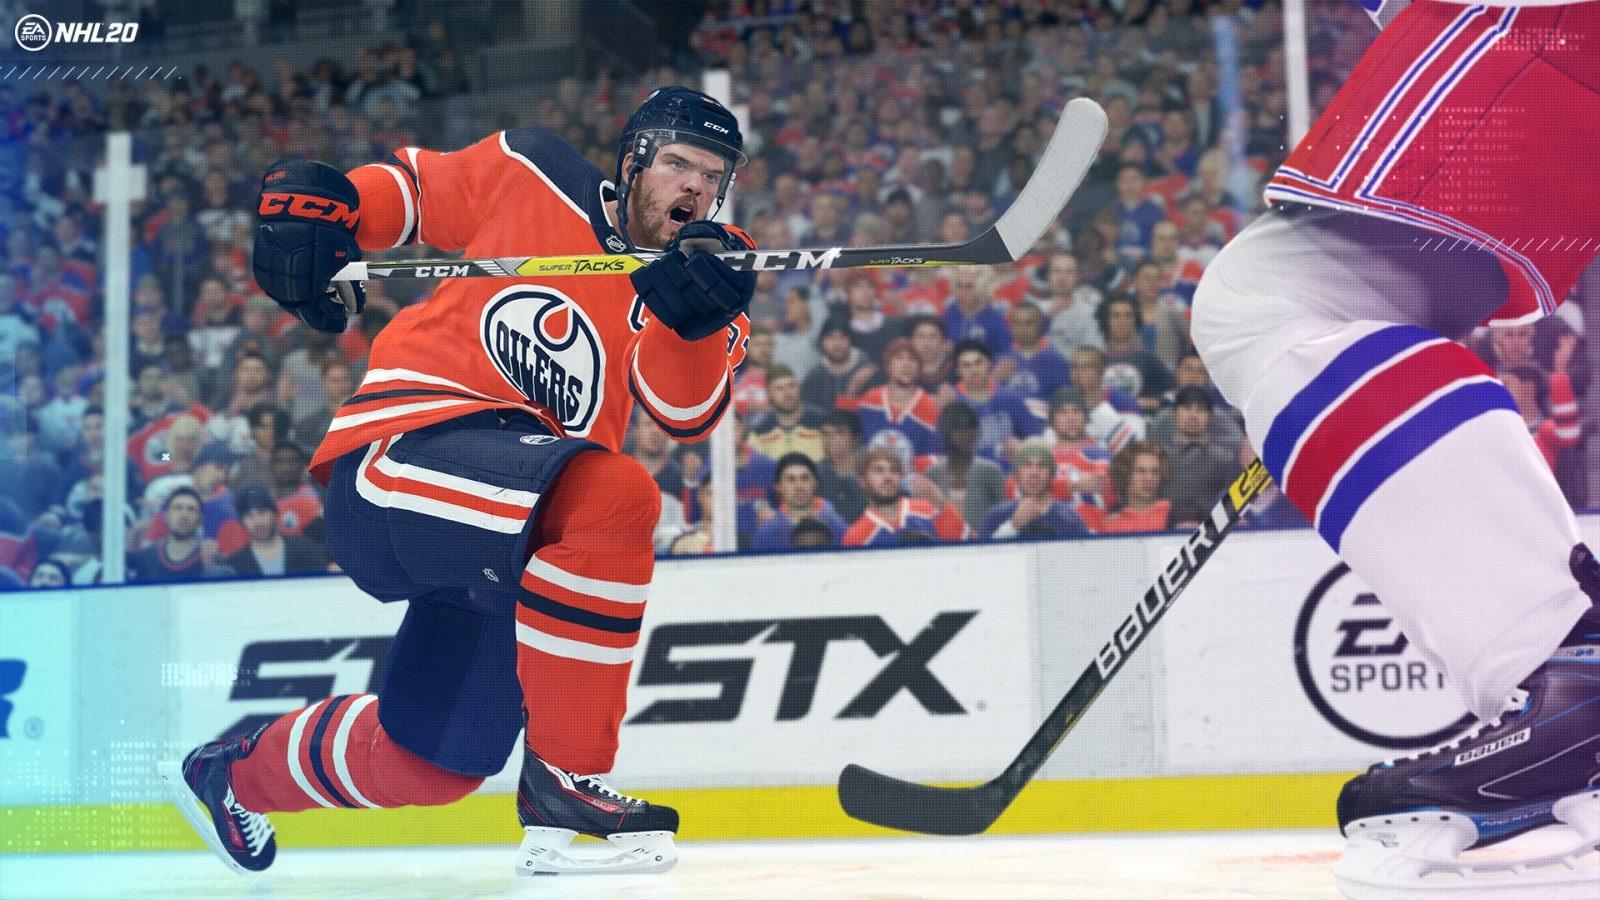 NHL 20; wallpaper: beta, cover